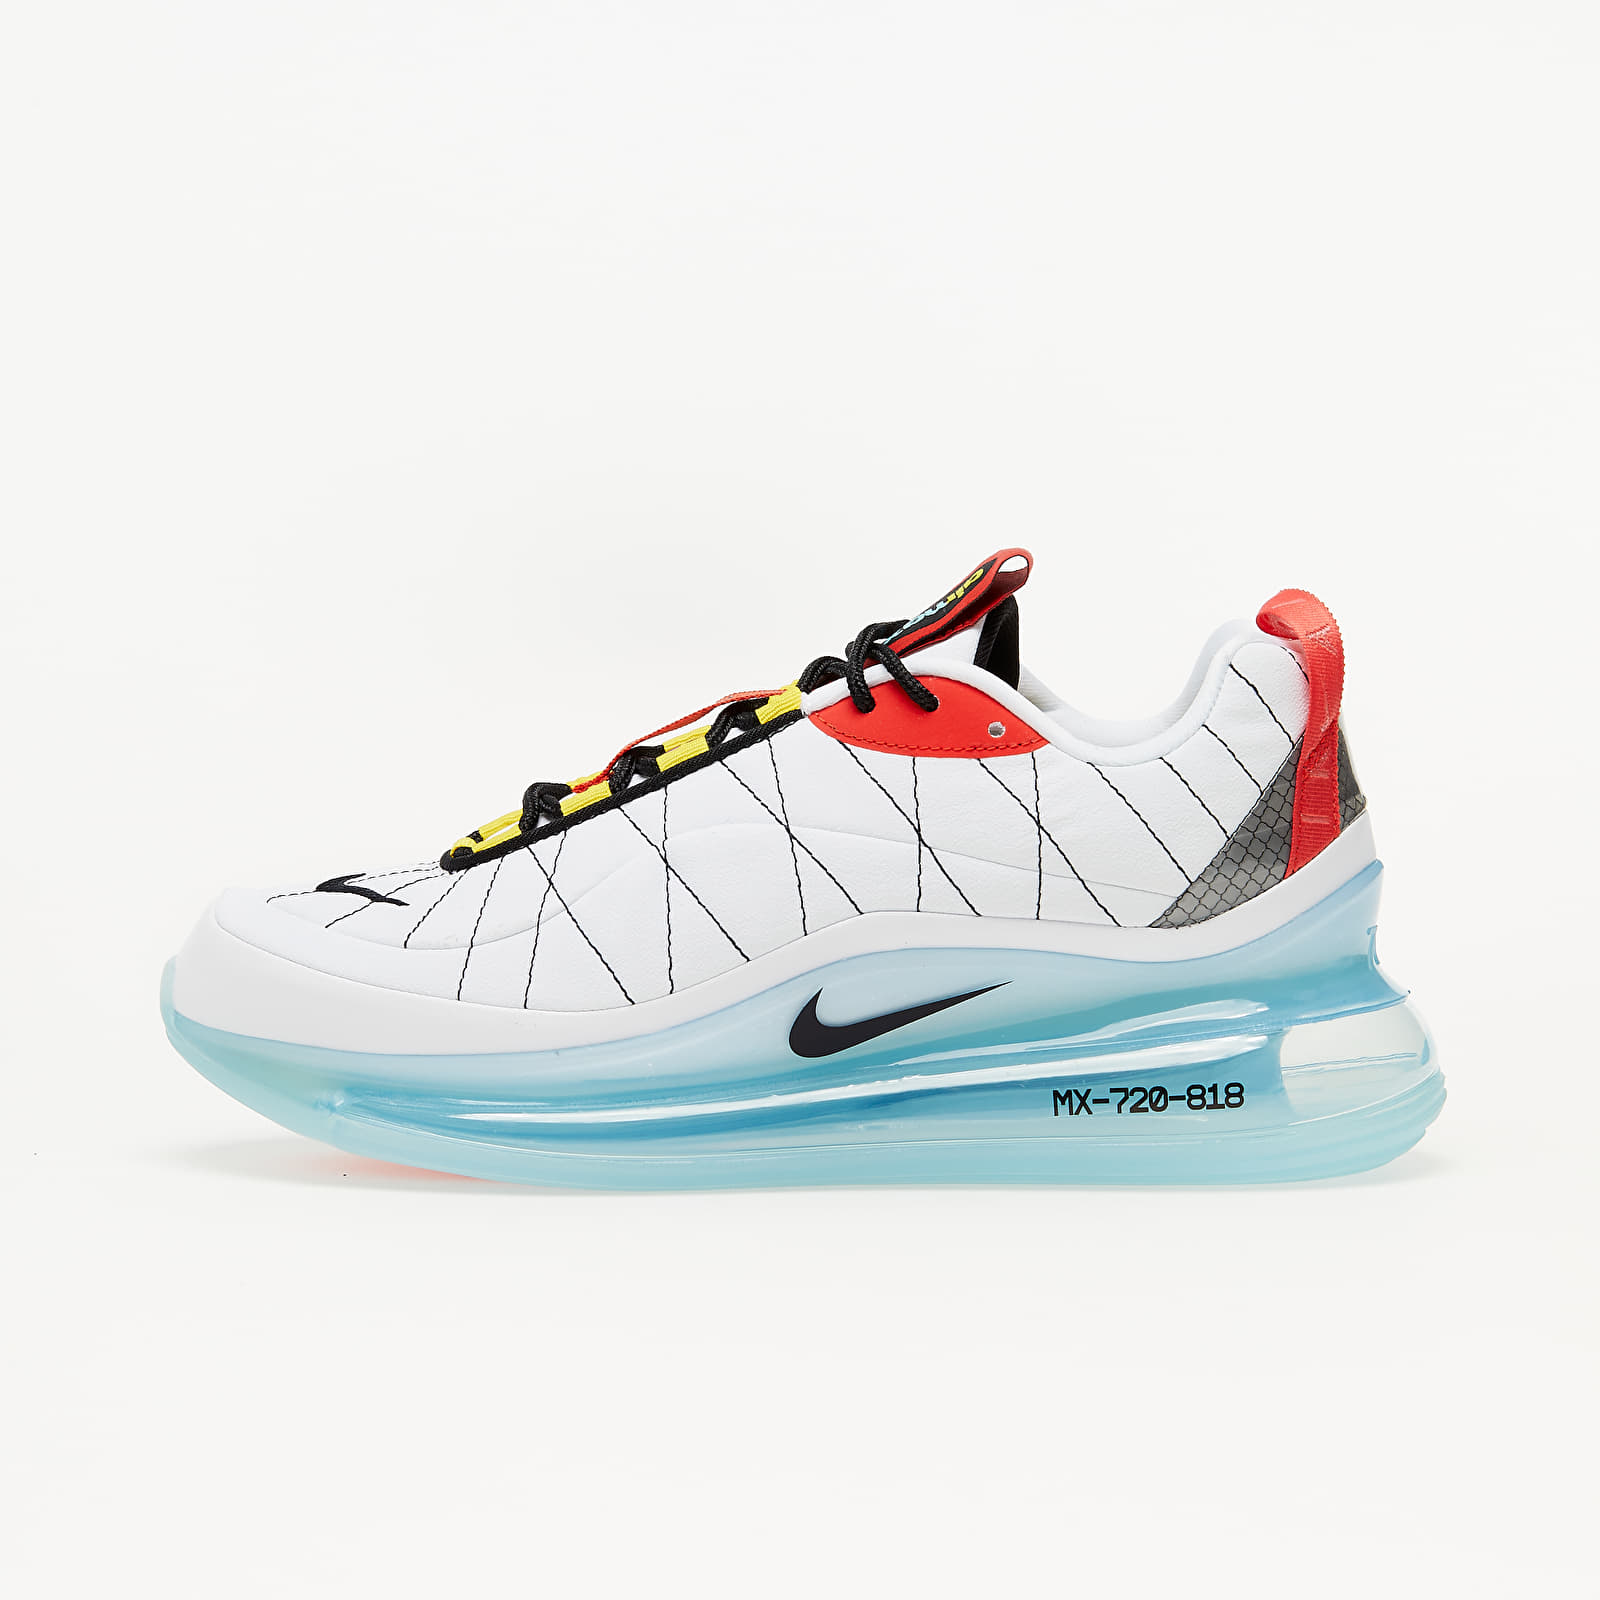 Nike MX-720-818 White/ Black-Speed Yellow-Chile Red EUR 42